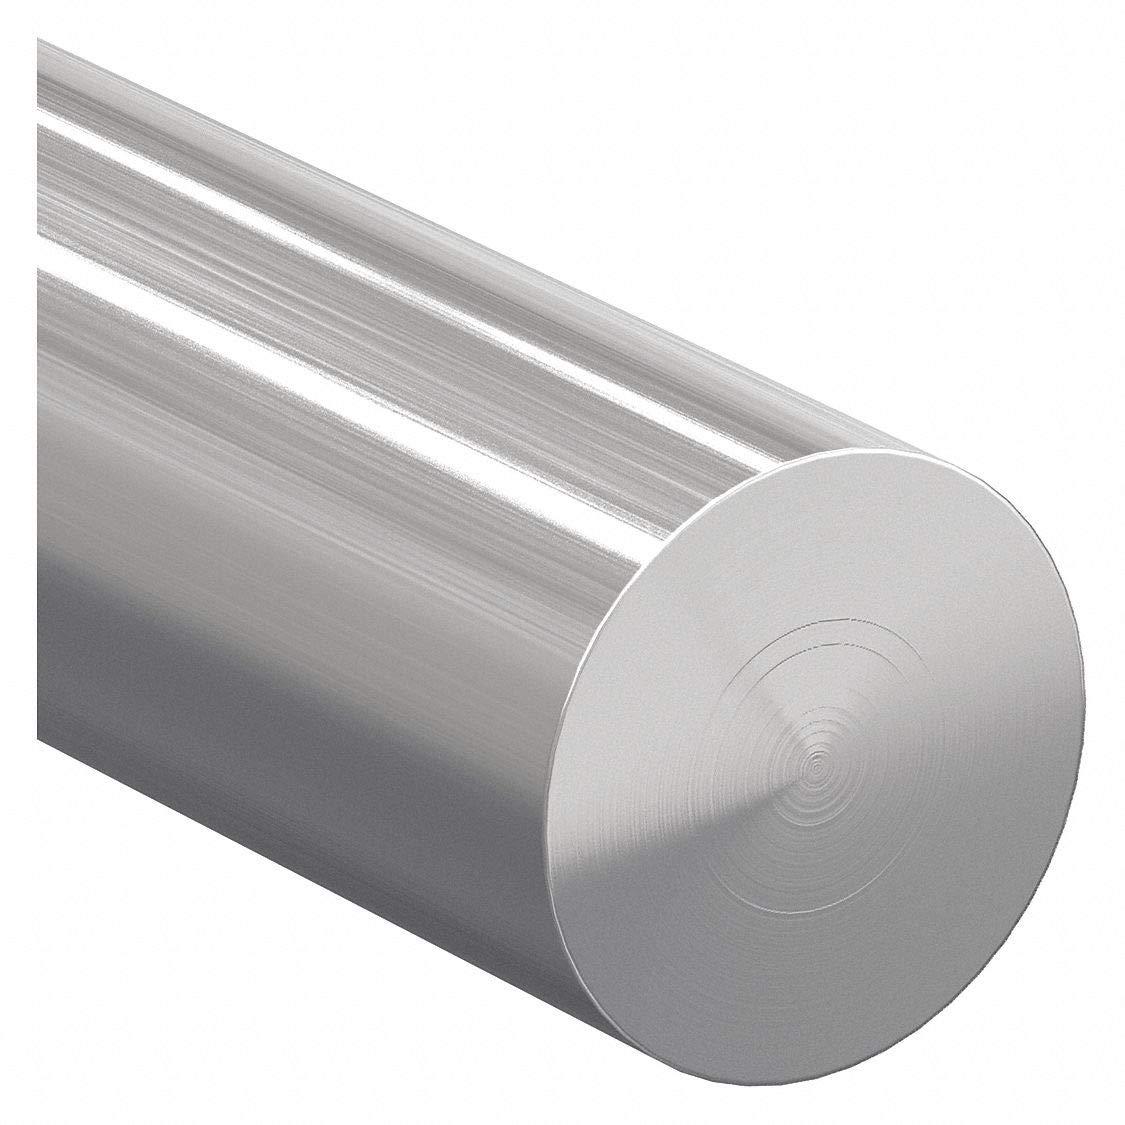 Mill T6511 Temper Finish Unpolished 7//8 Diameter Extruded ASTM B221 36 Length 6061 Aluminum Round Rod